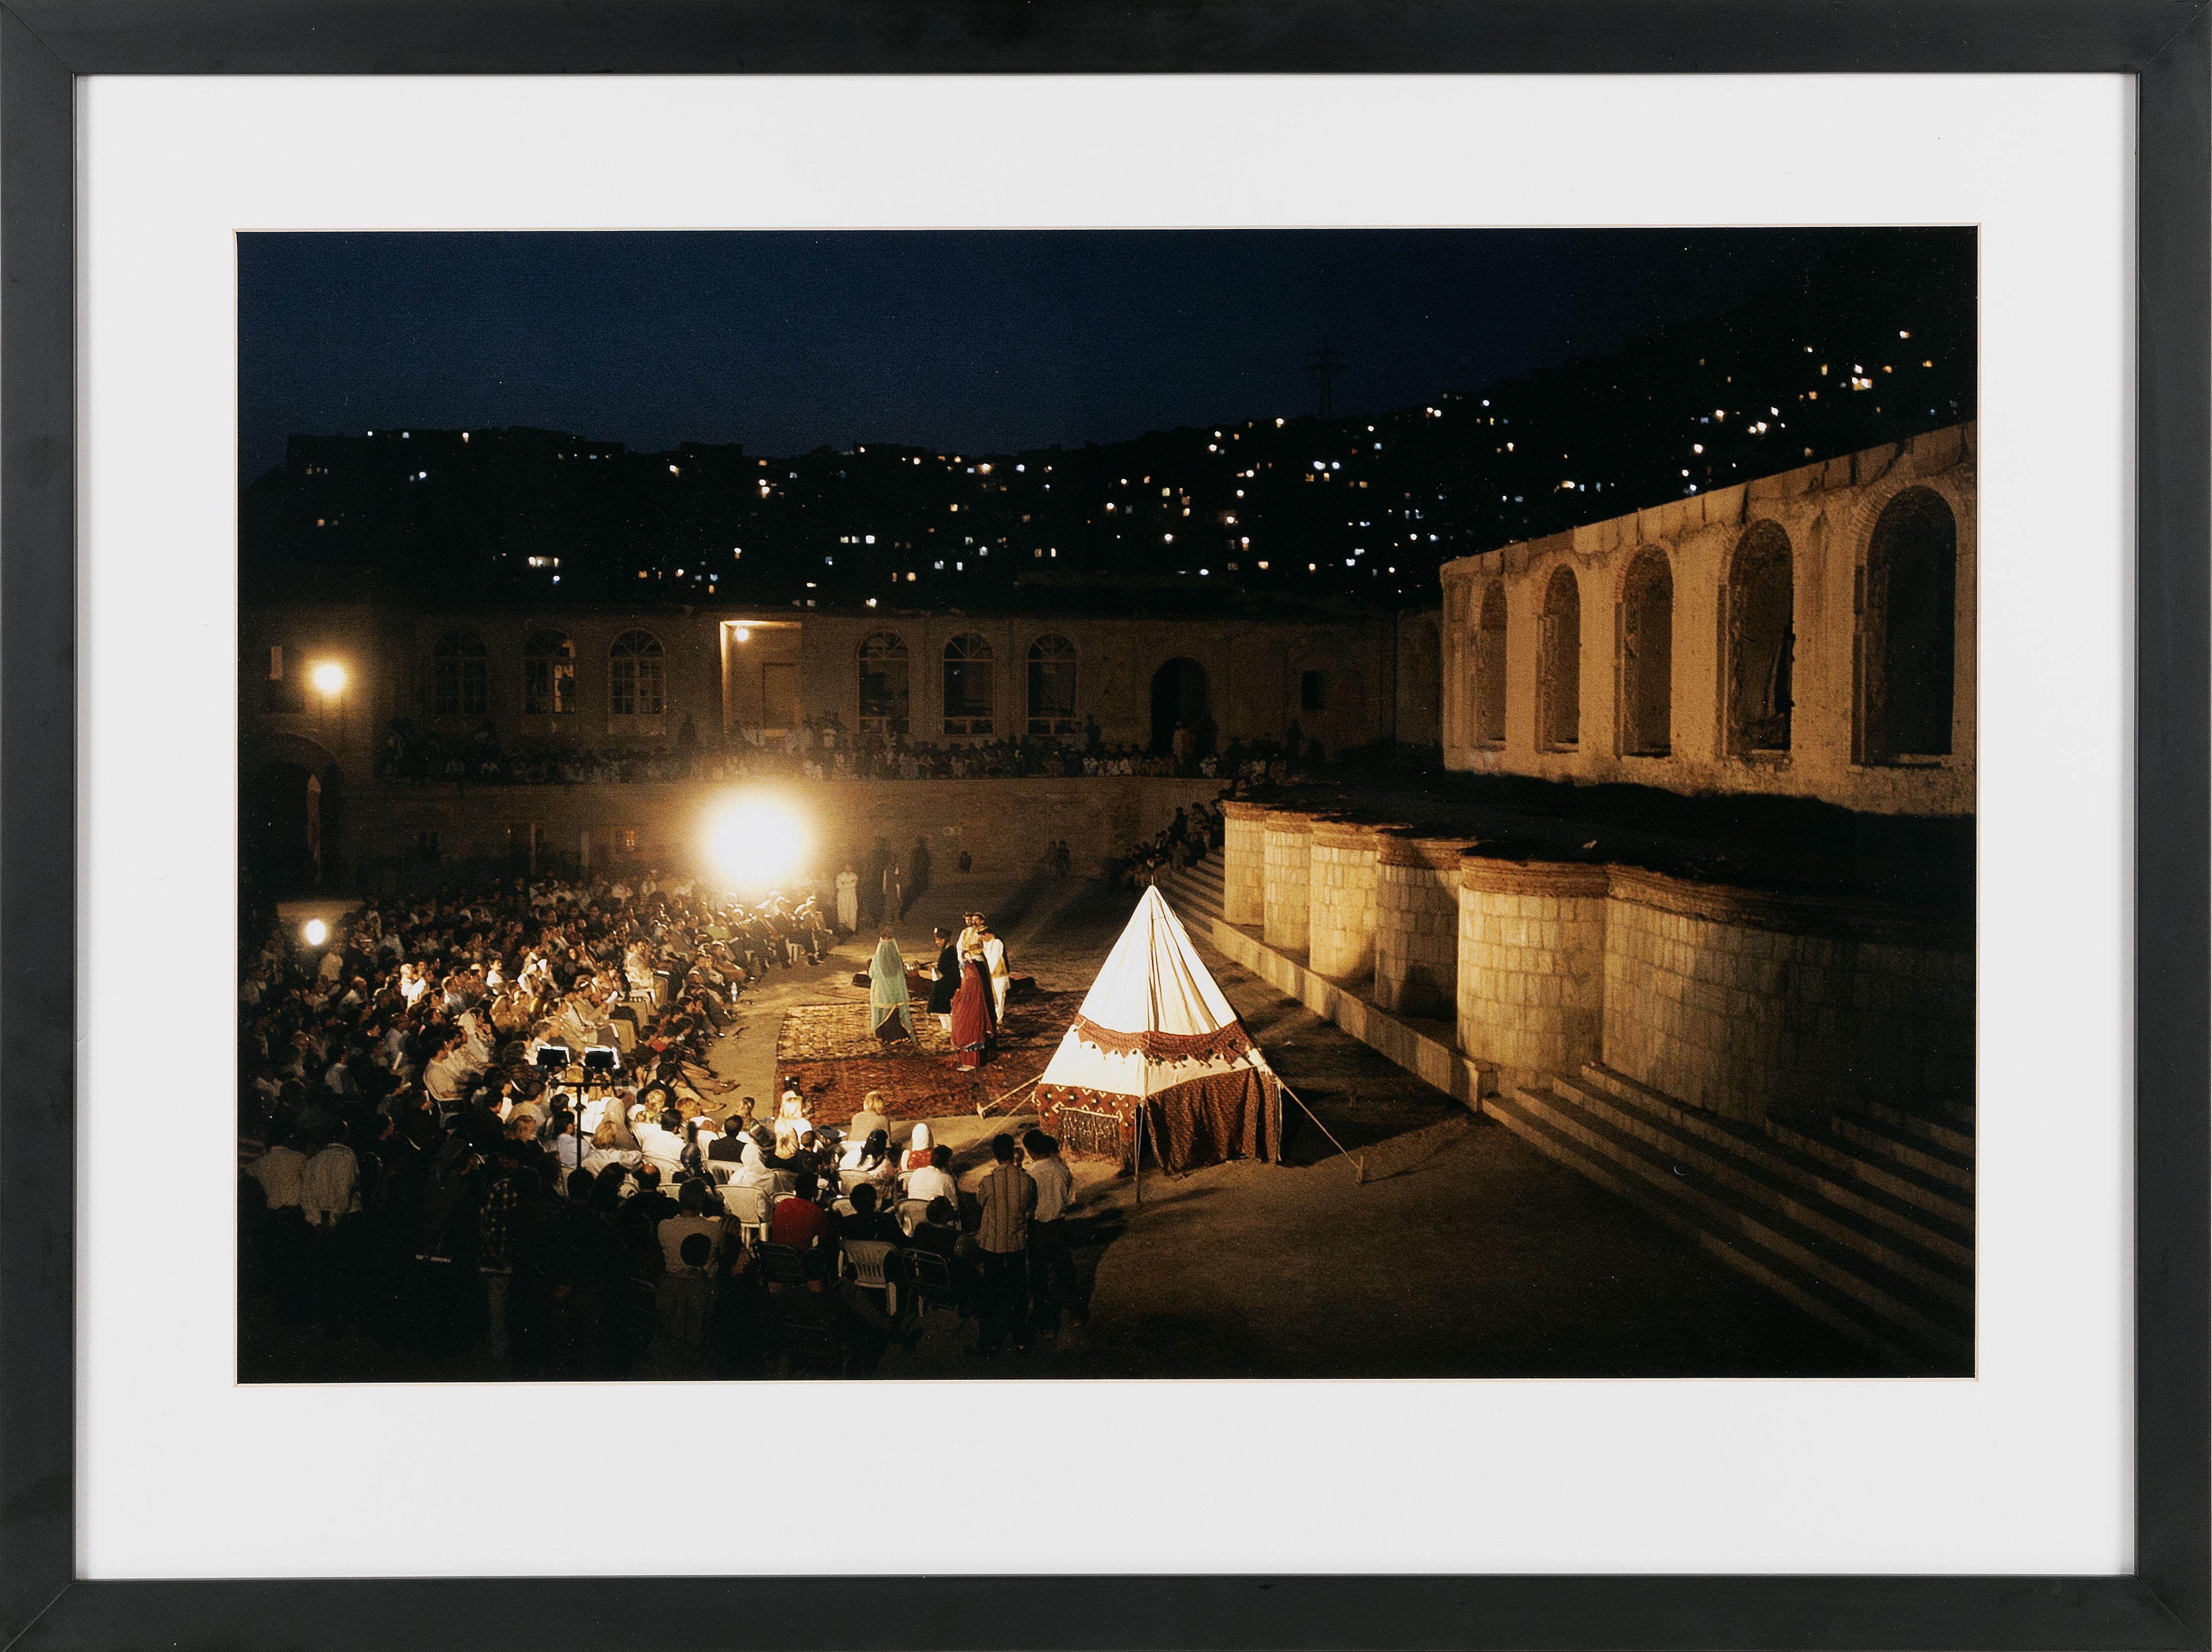 FRAMED COLOR PHOTOGRAPH: SHAKESPEARE IN KABUL AP photo, circa 2005 18